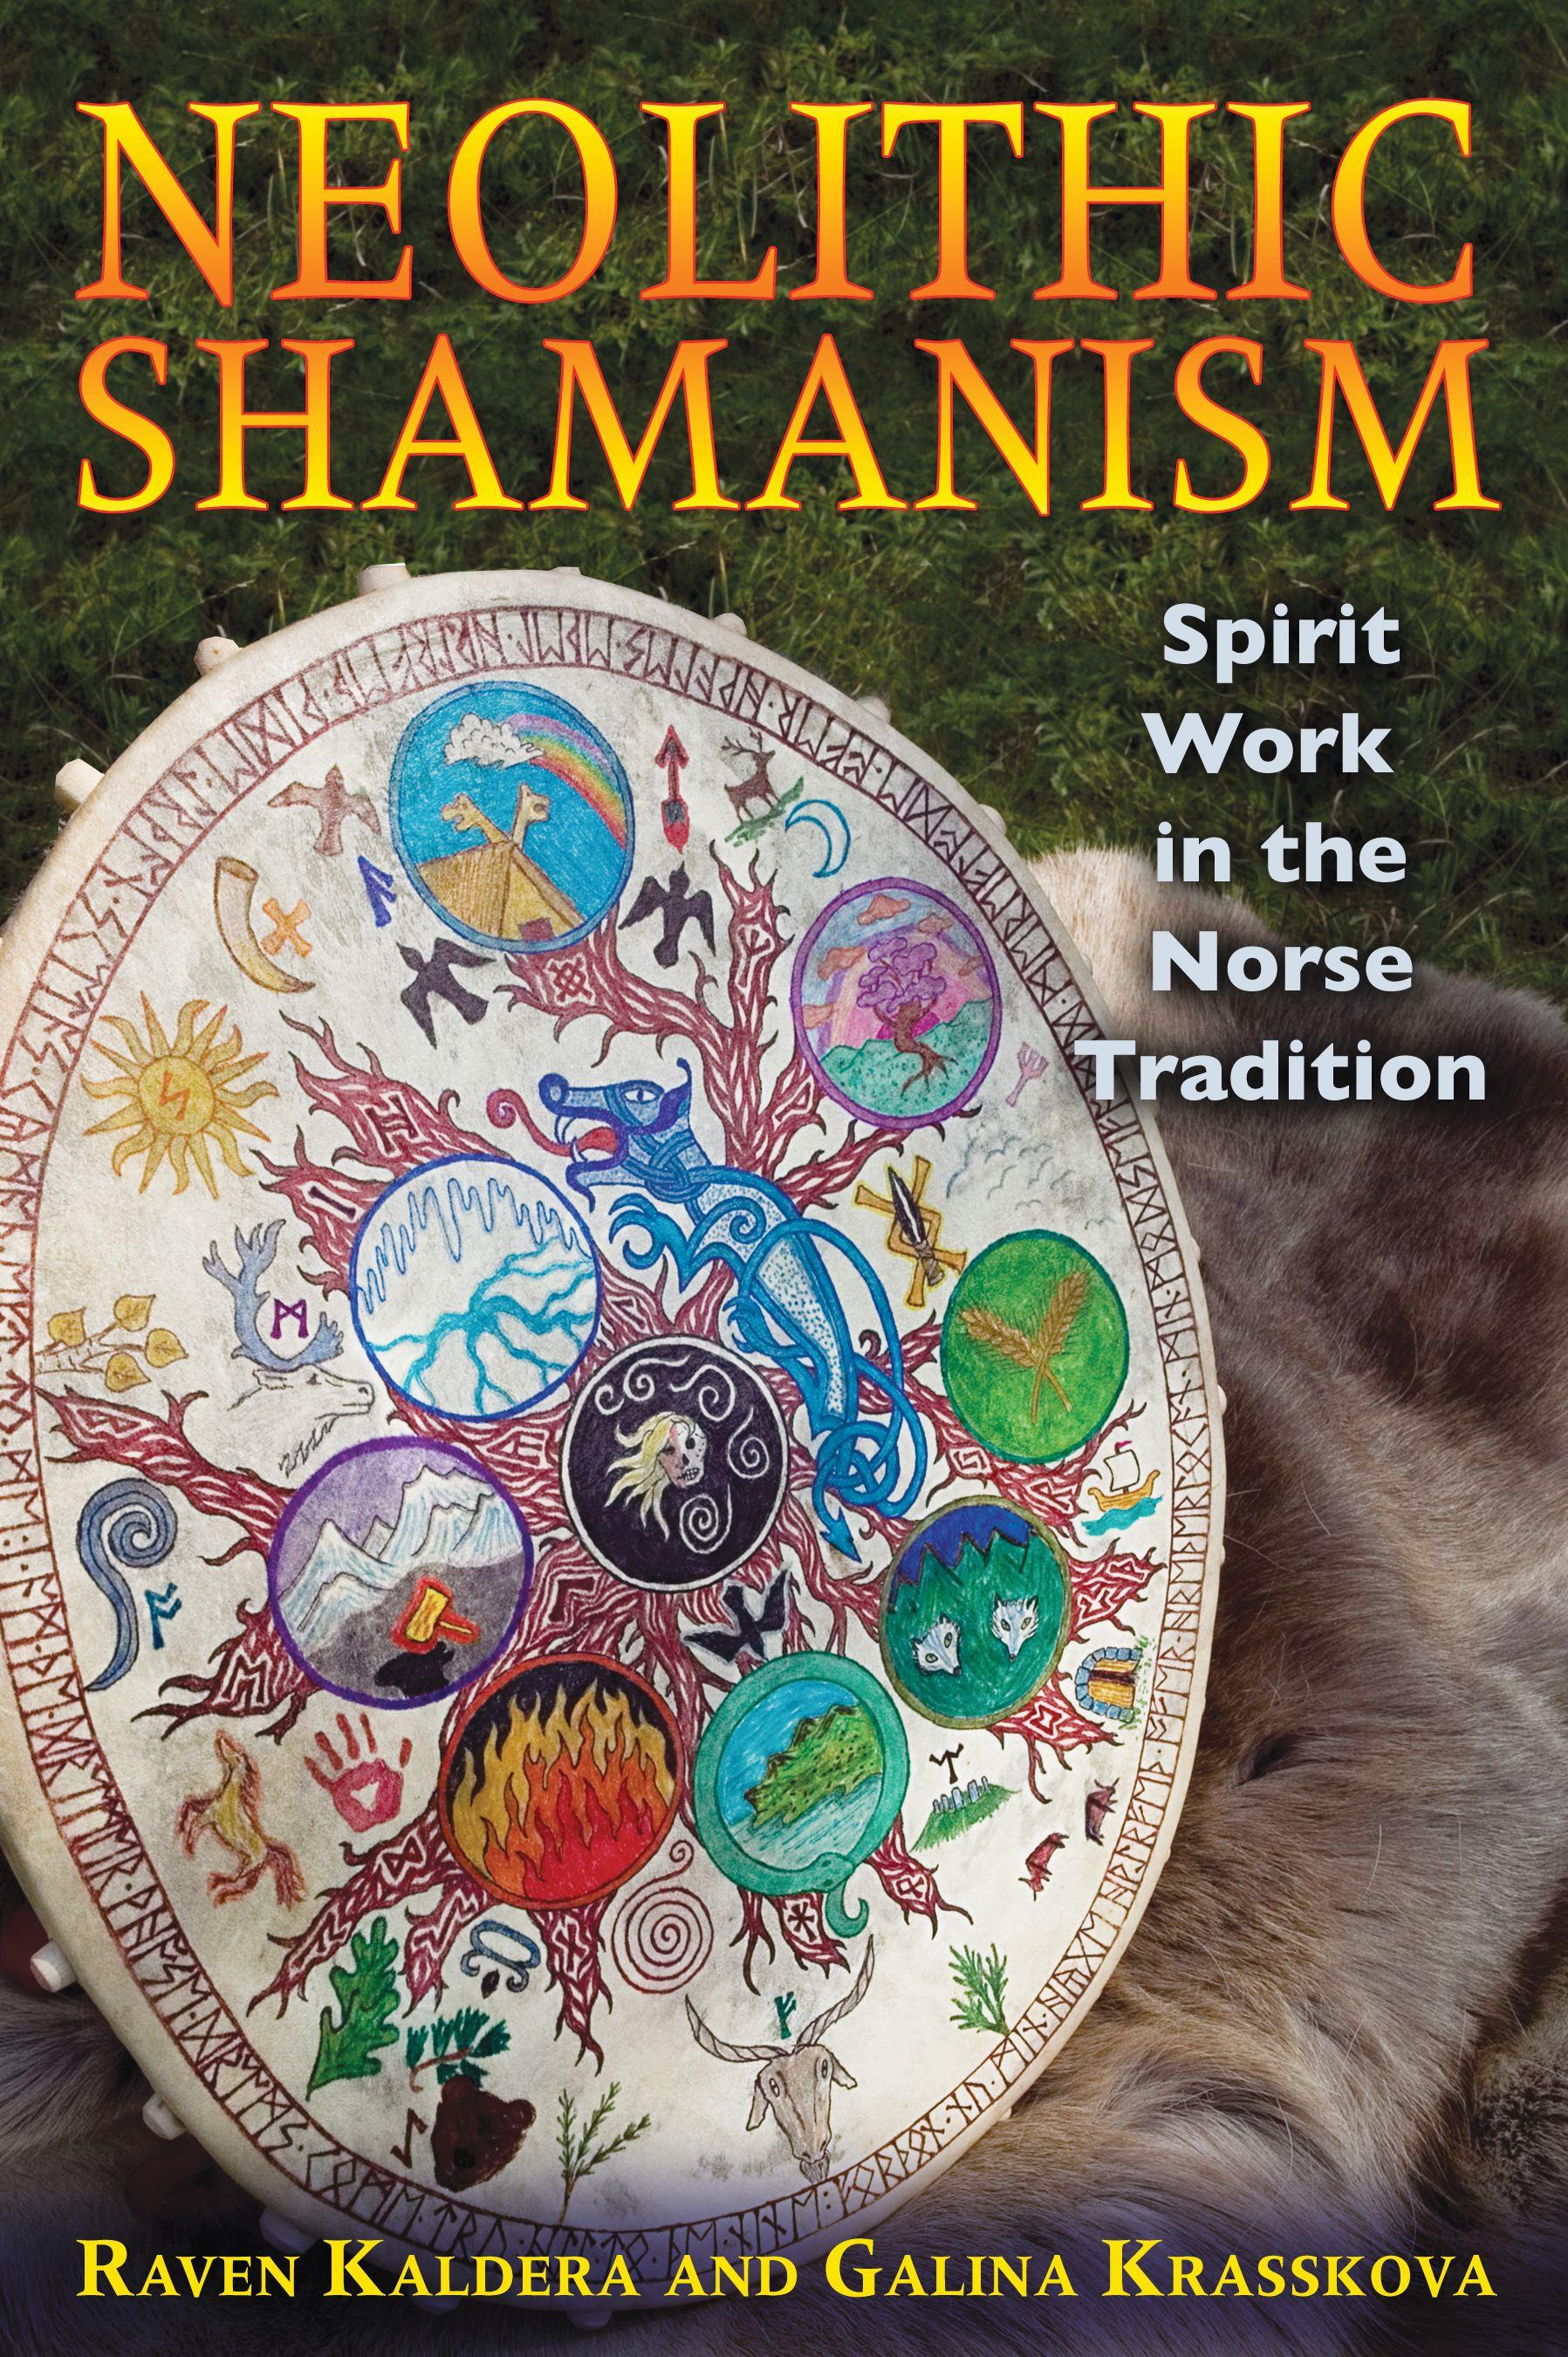 Neolithic shamanism 9781594774904 hr